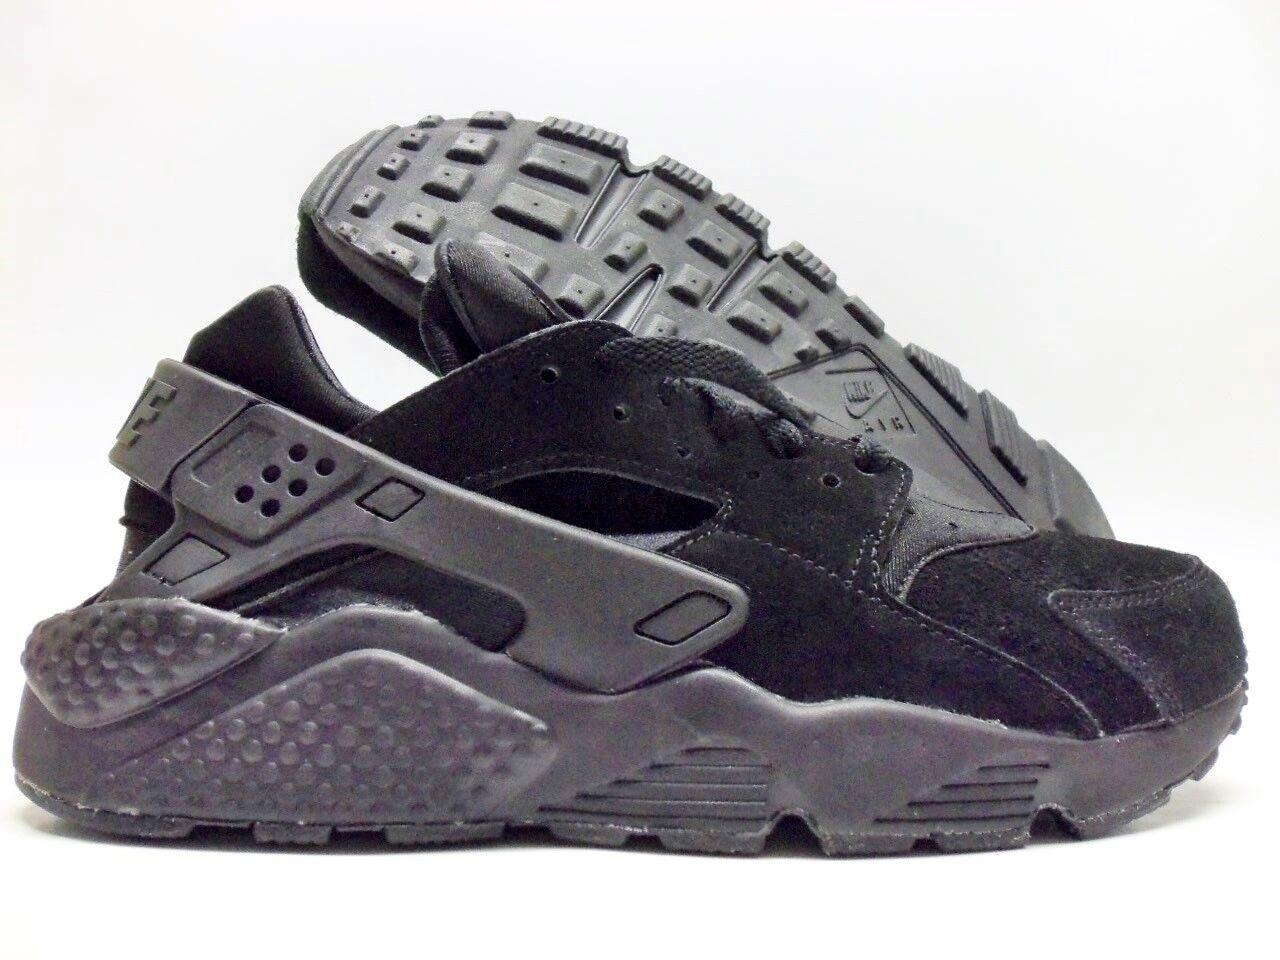 Nike air huarache correre id triplo nero dimensioni uomini 9 [777330-989]